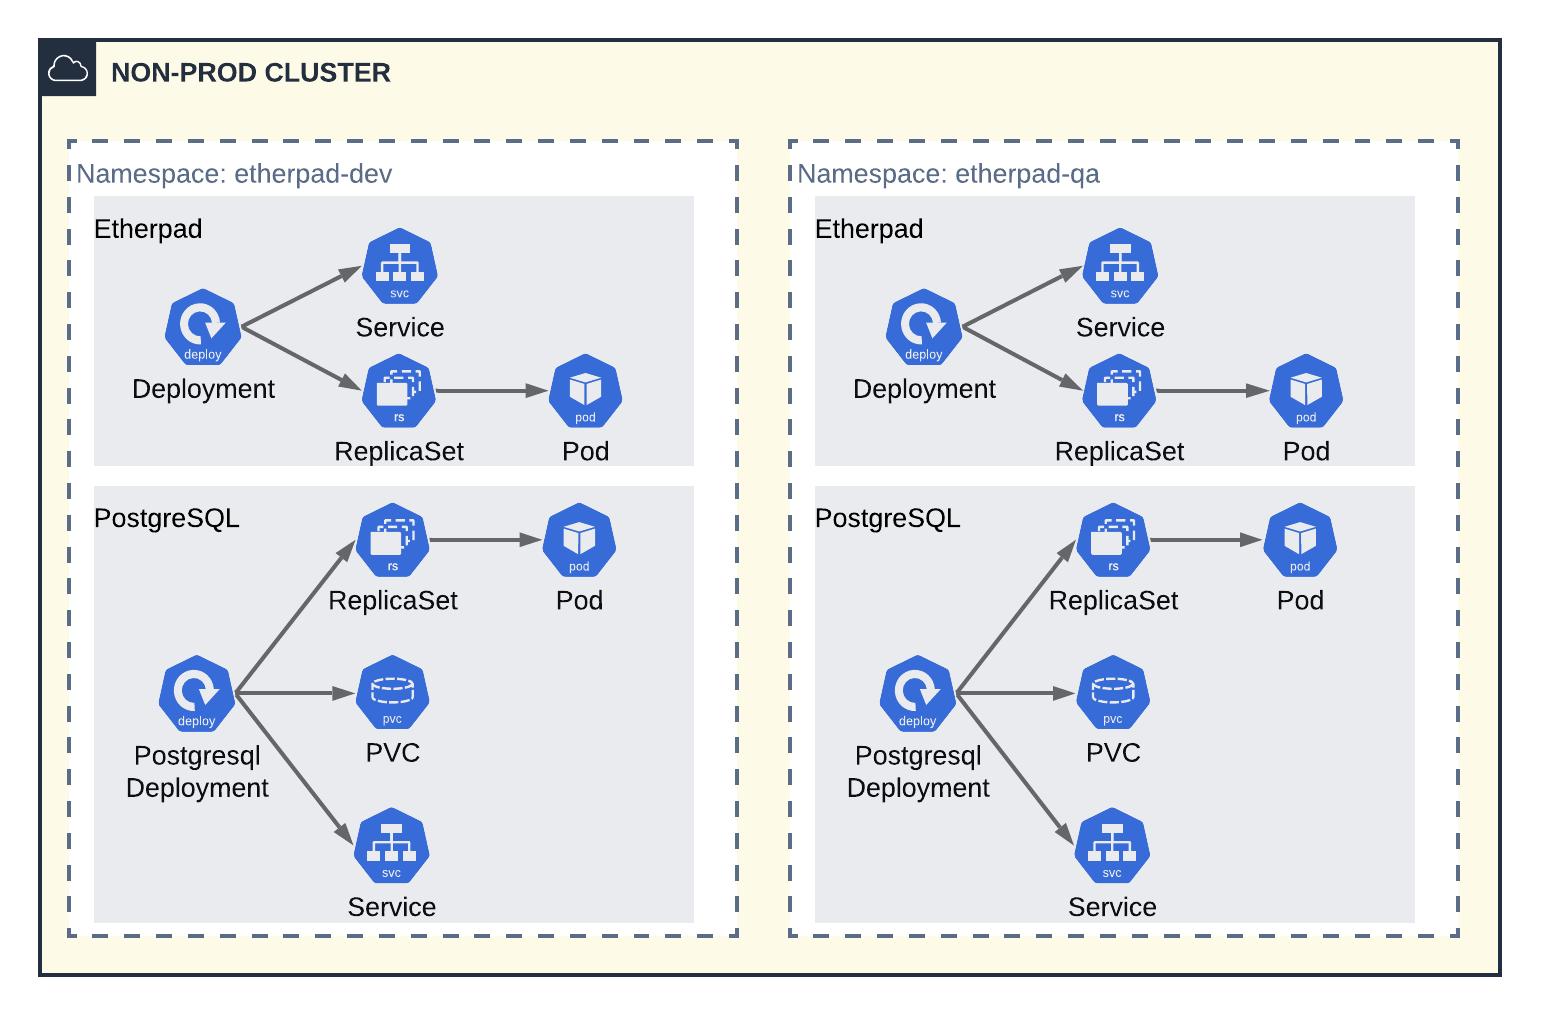 nonprod-cluster